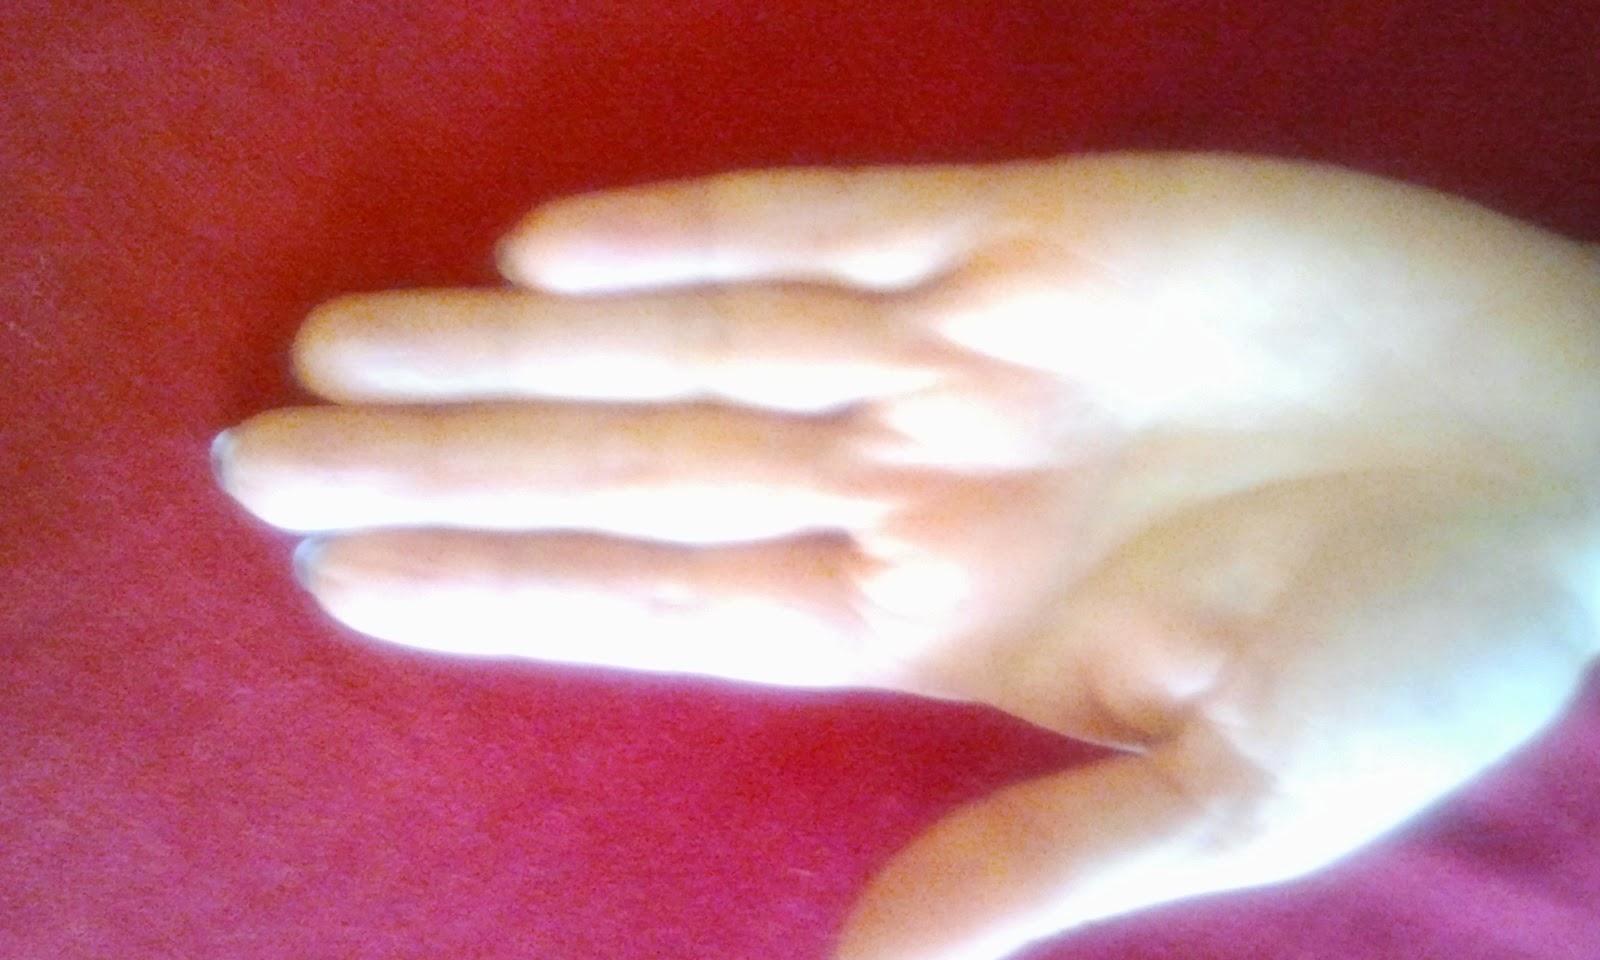 Manos blancas